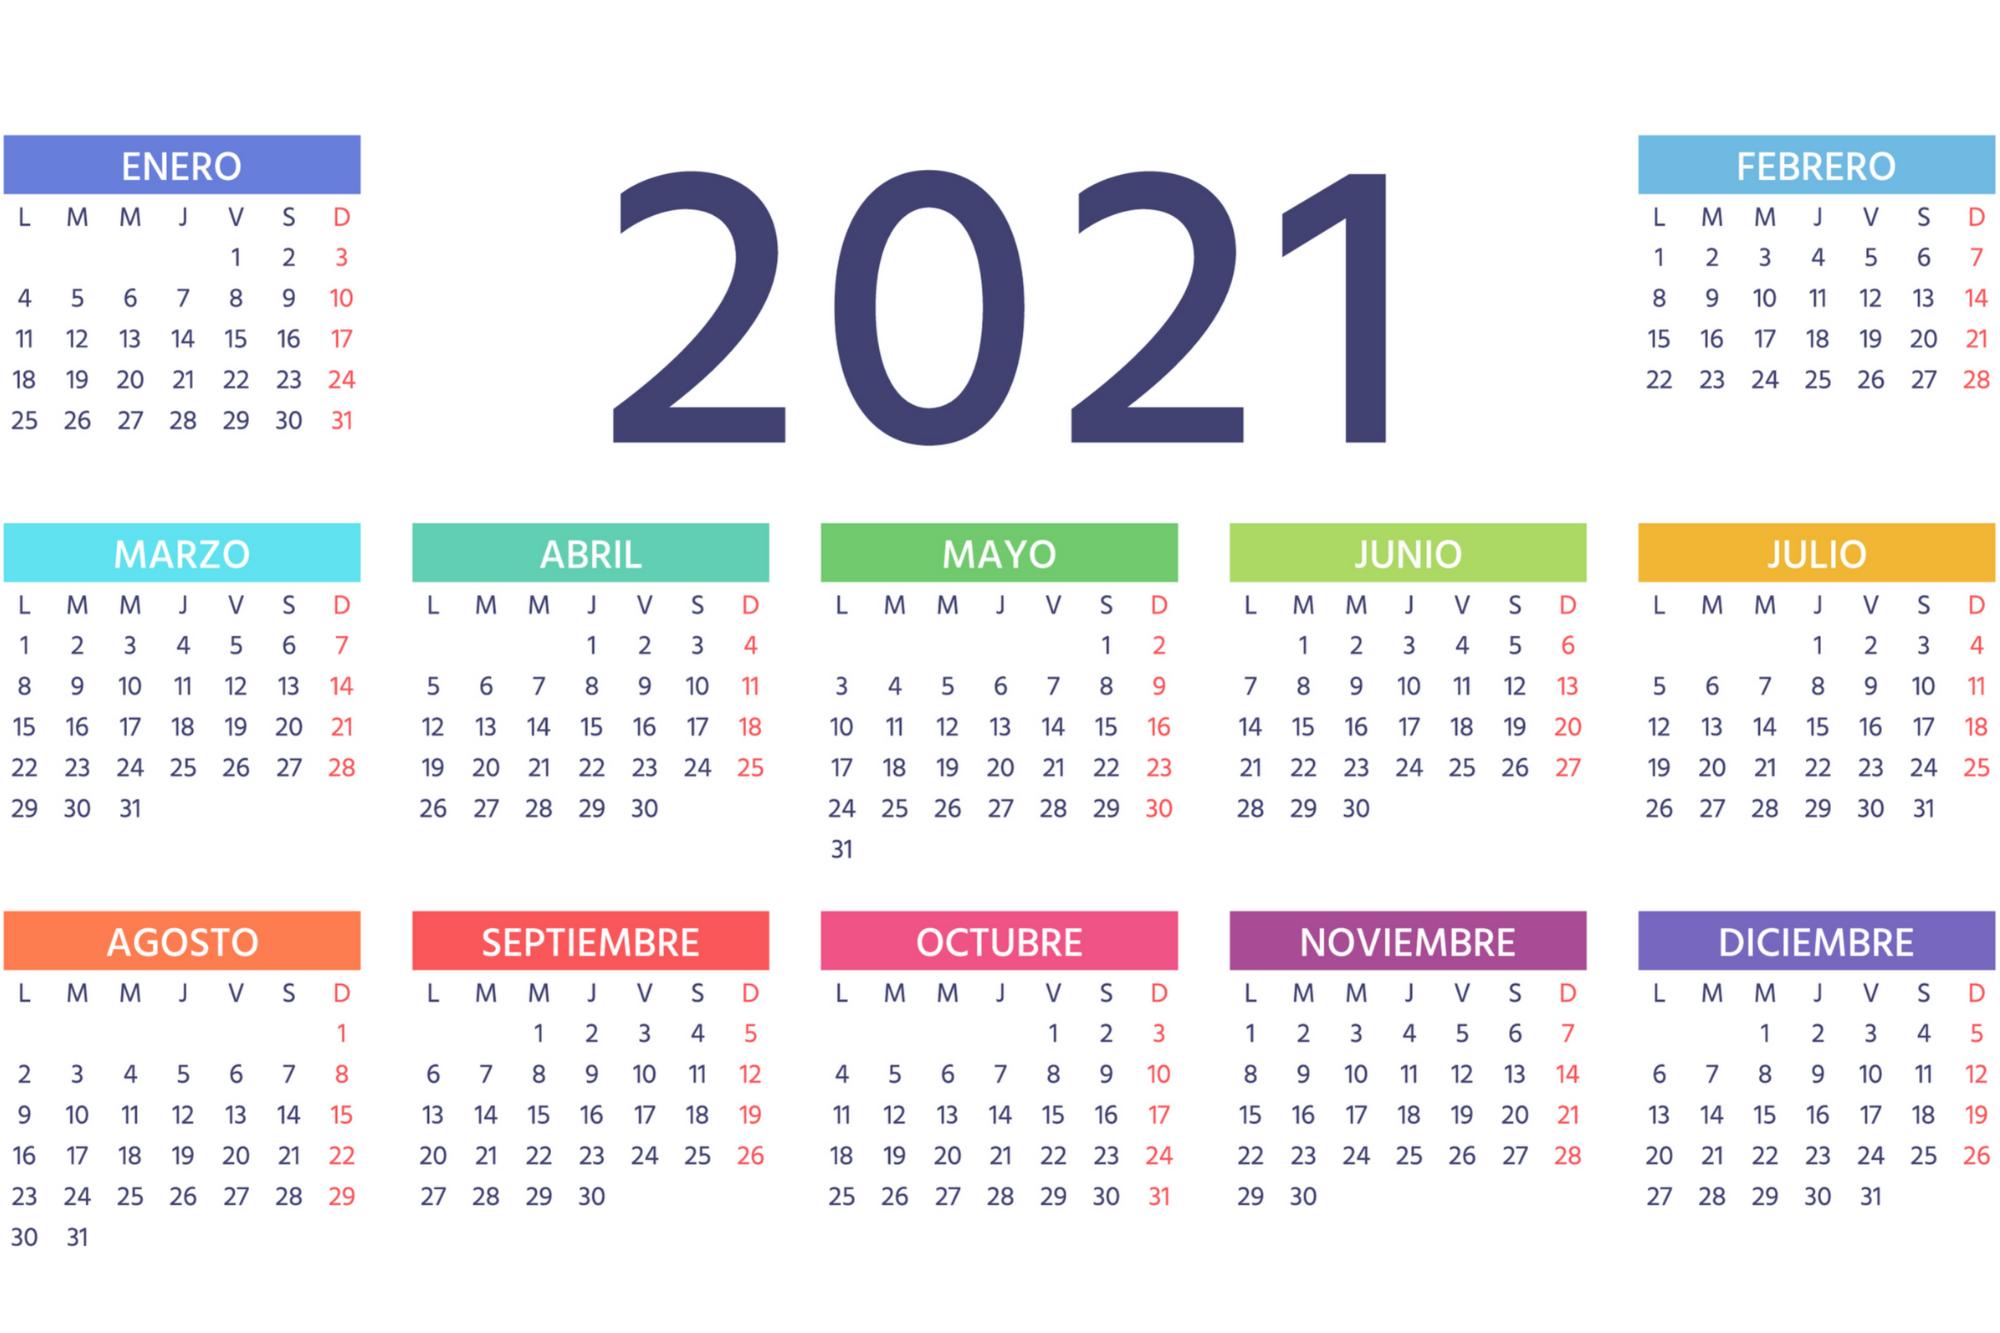 Caendario Juliano 2021